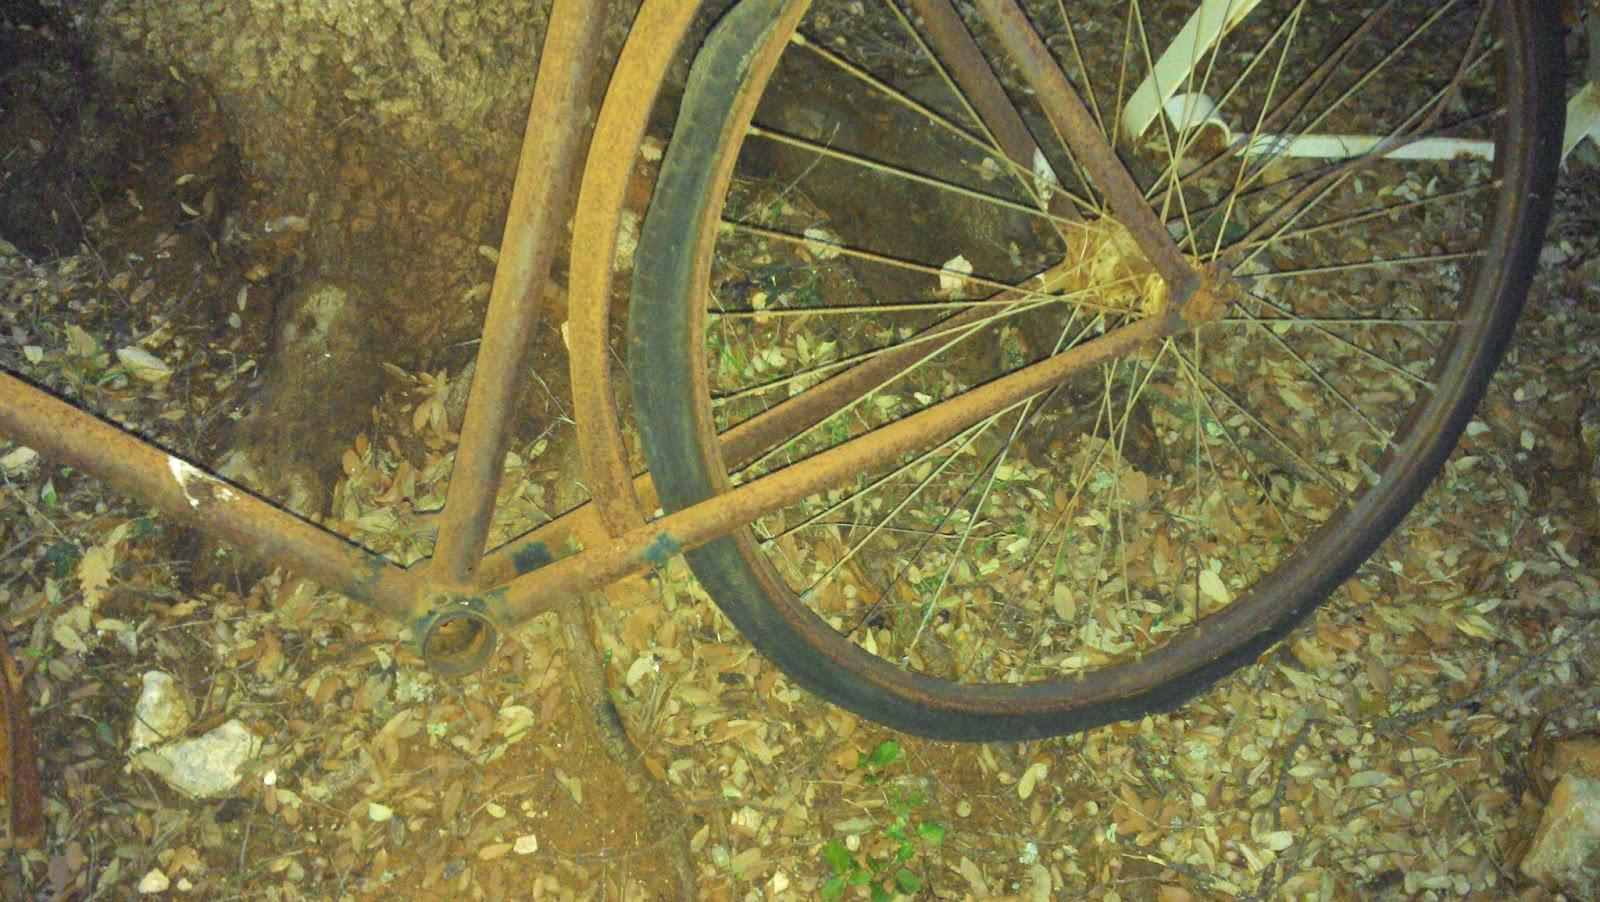 Le Vide Grenier De Didou La Brocante: Ancien Vélo Tout ... serapportantà Velo Deco Jardin